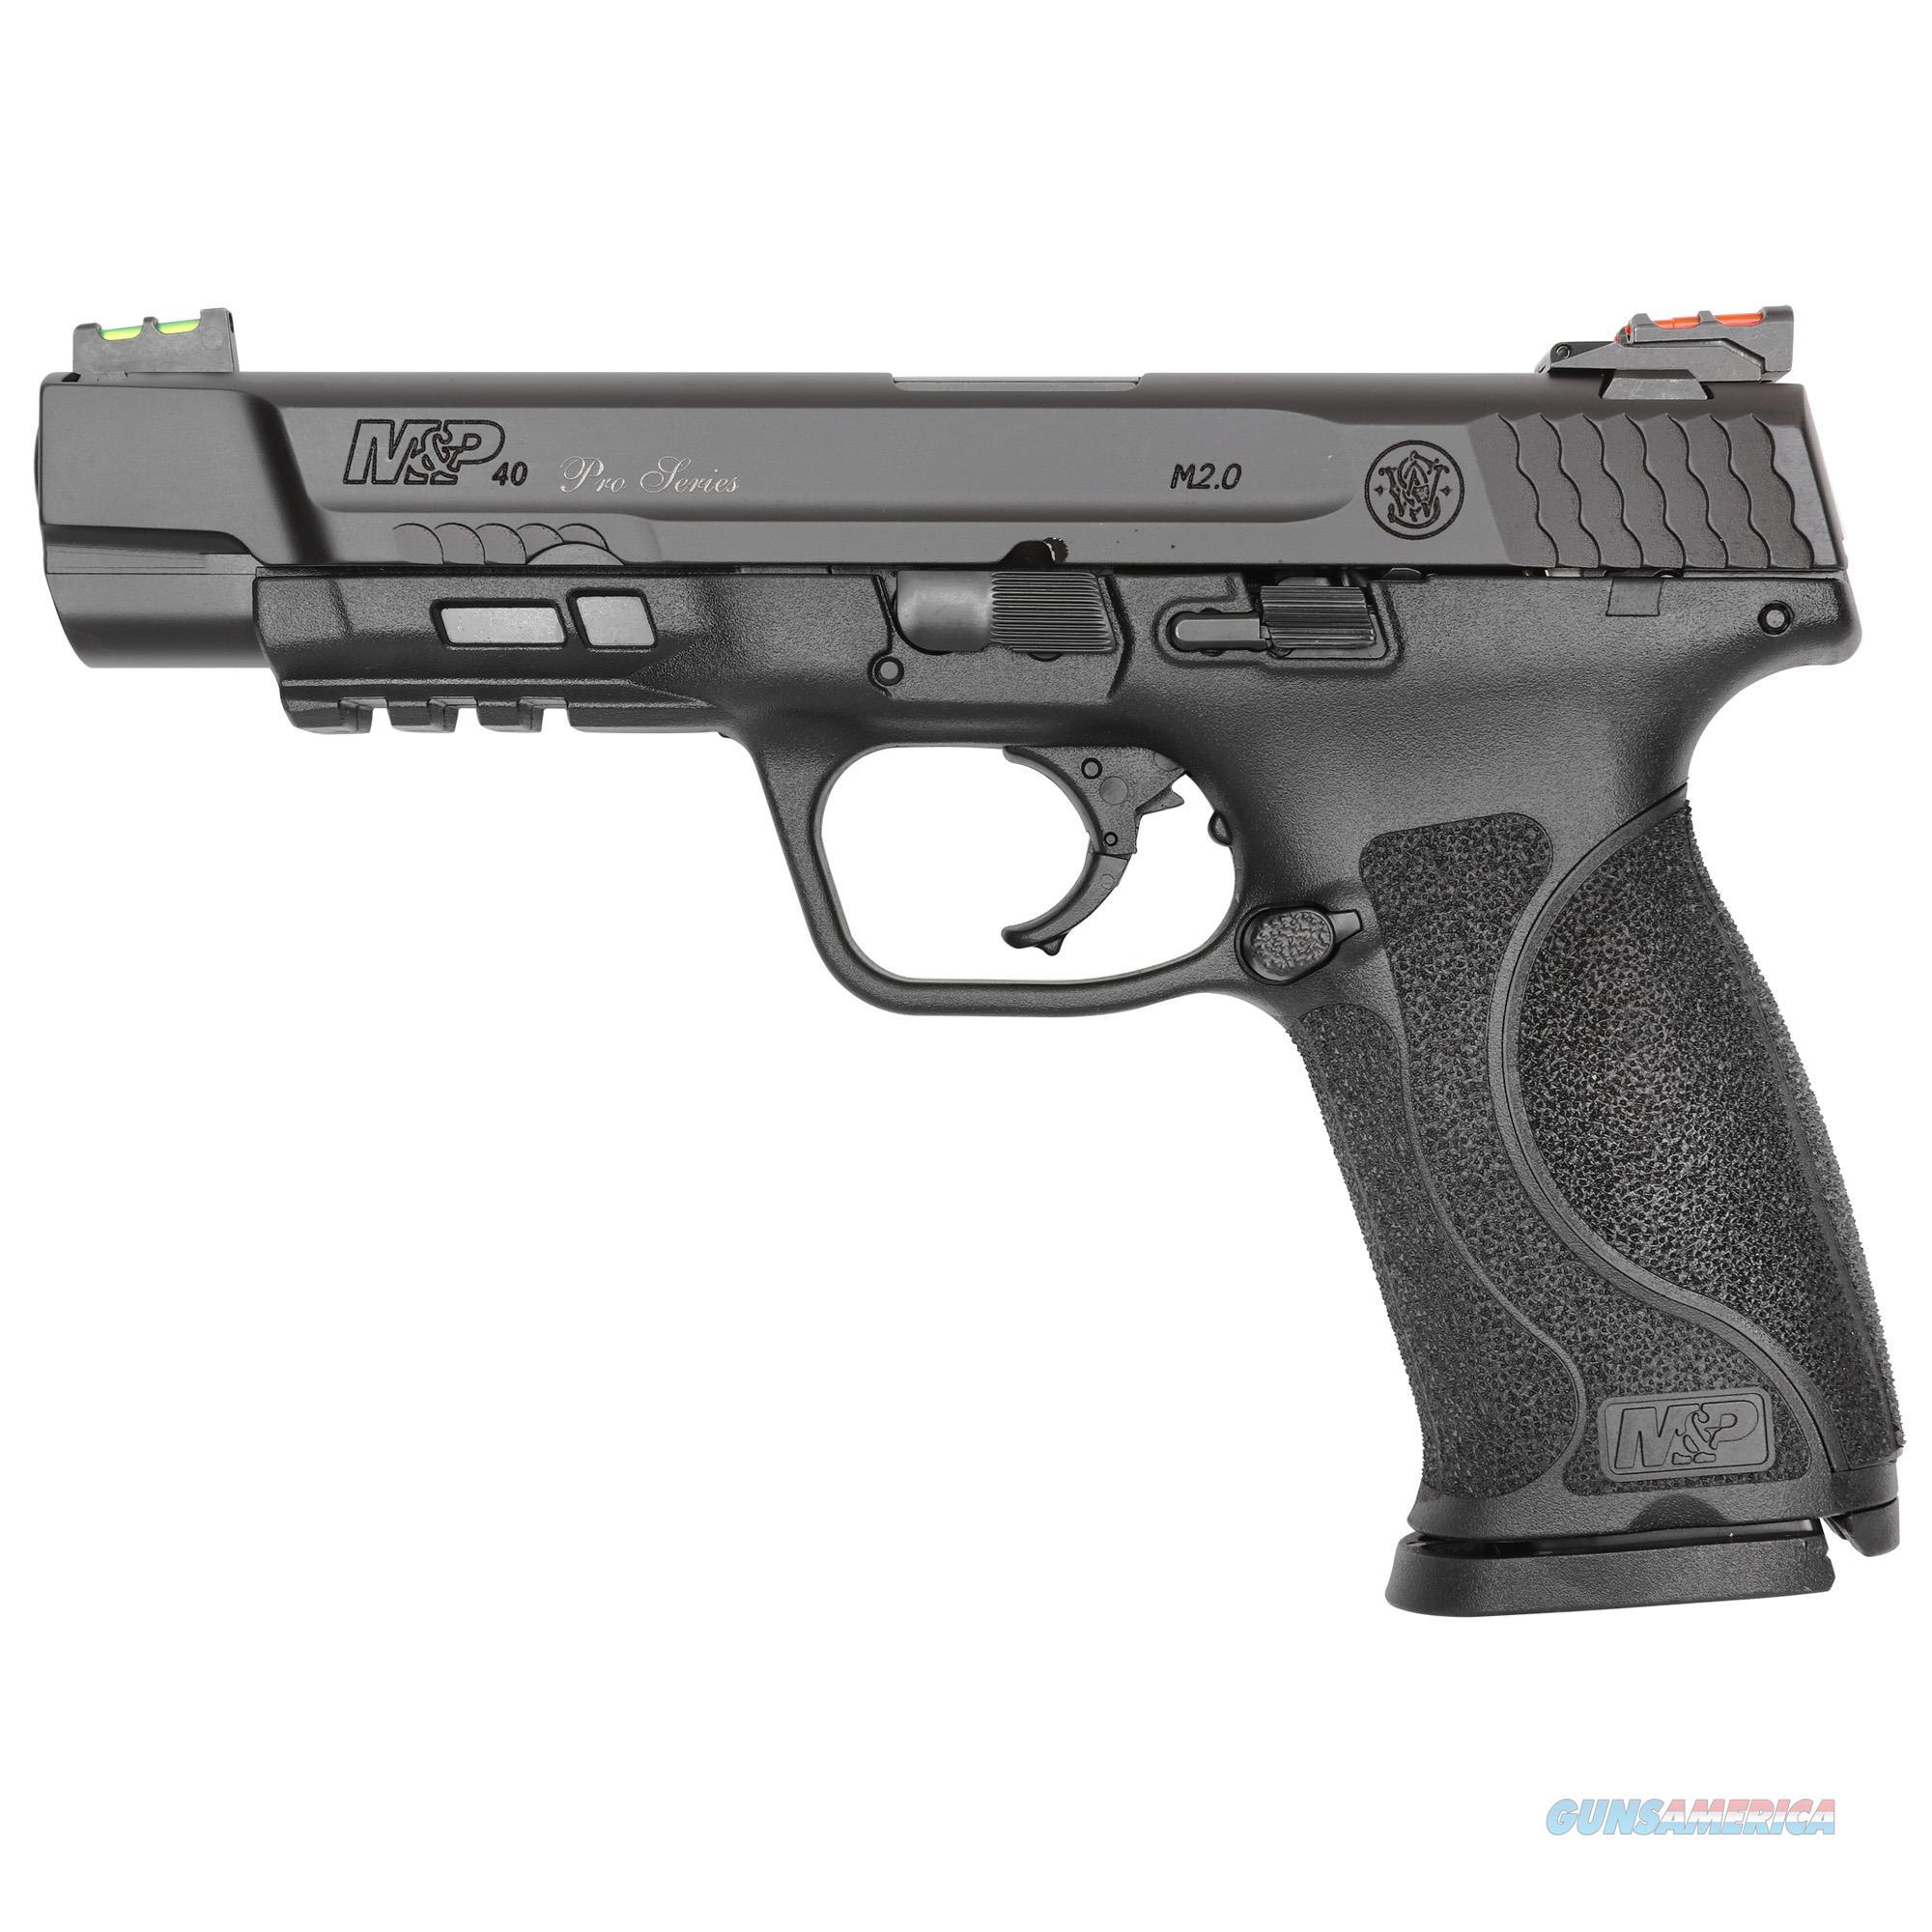 Smith & Wesson M&p 40, S&w M&p40     11821 Pcpro 40 5in  2.0 Nts Blk 15r  Guns > Pistols > 1911 Pistol Copies (non-Colt)